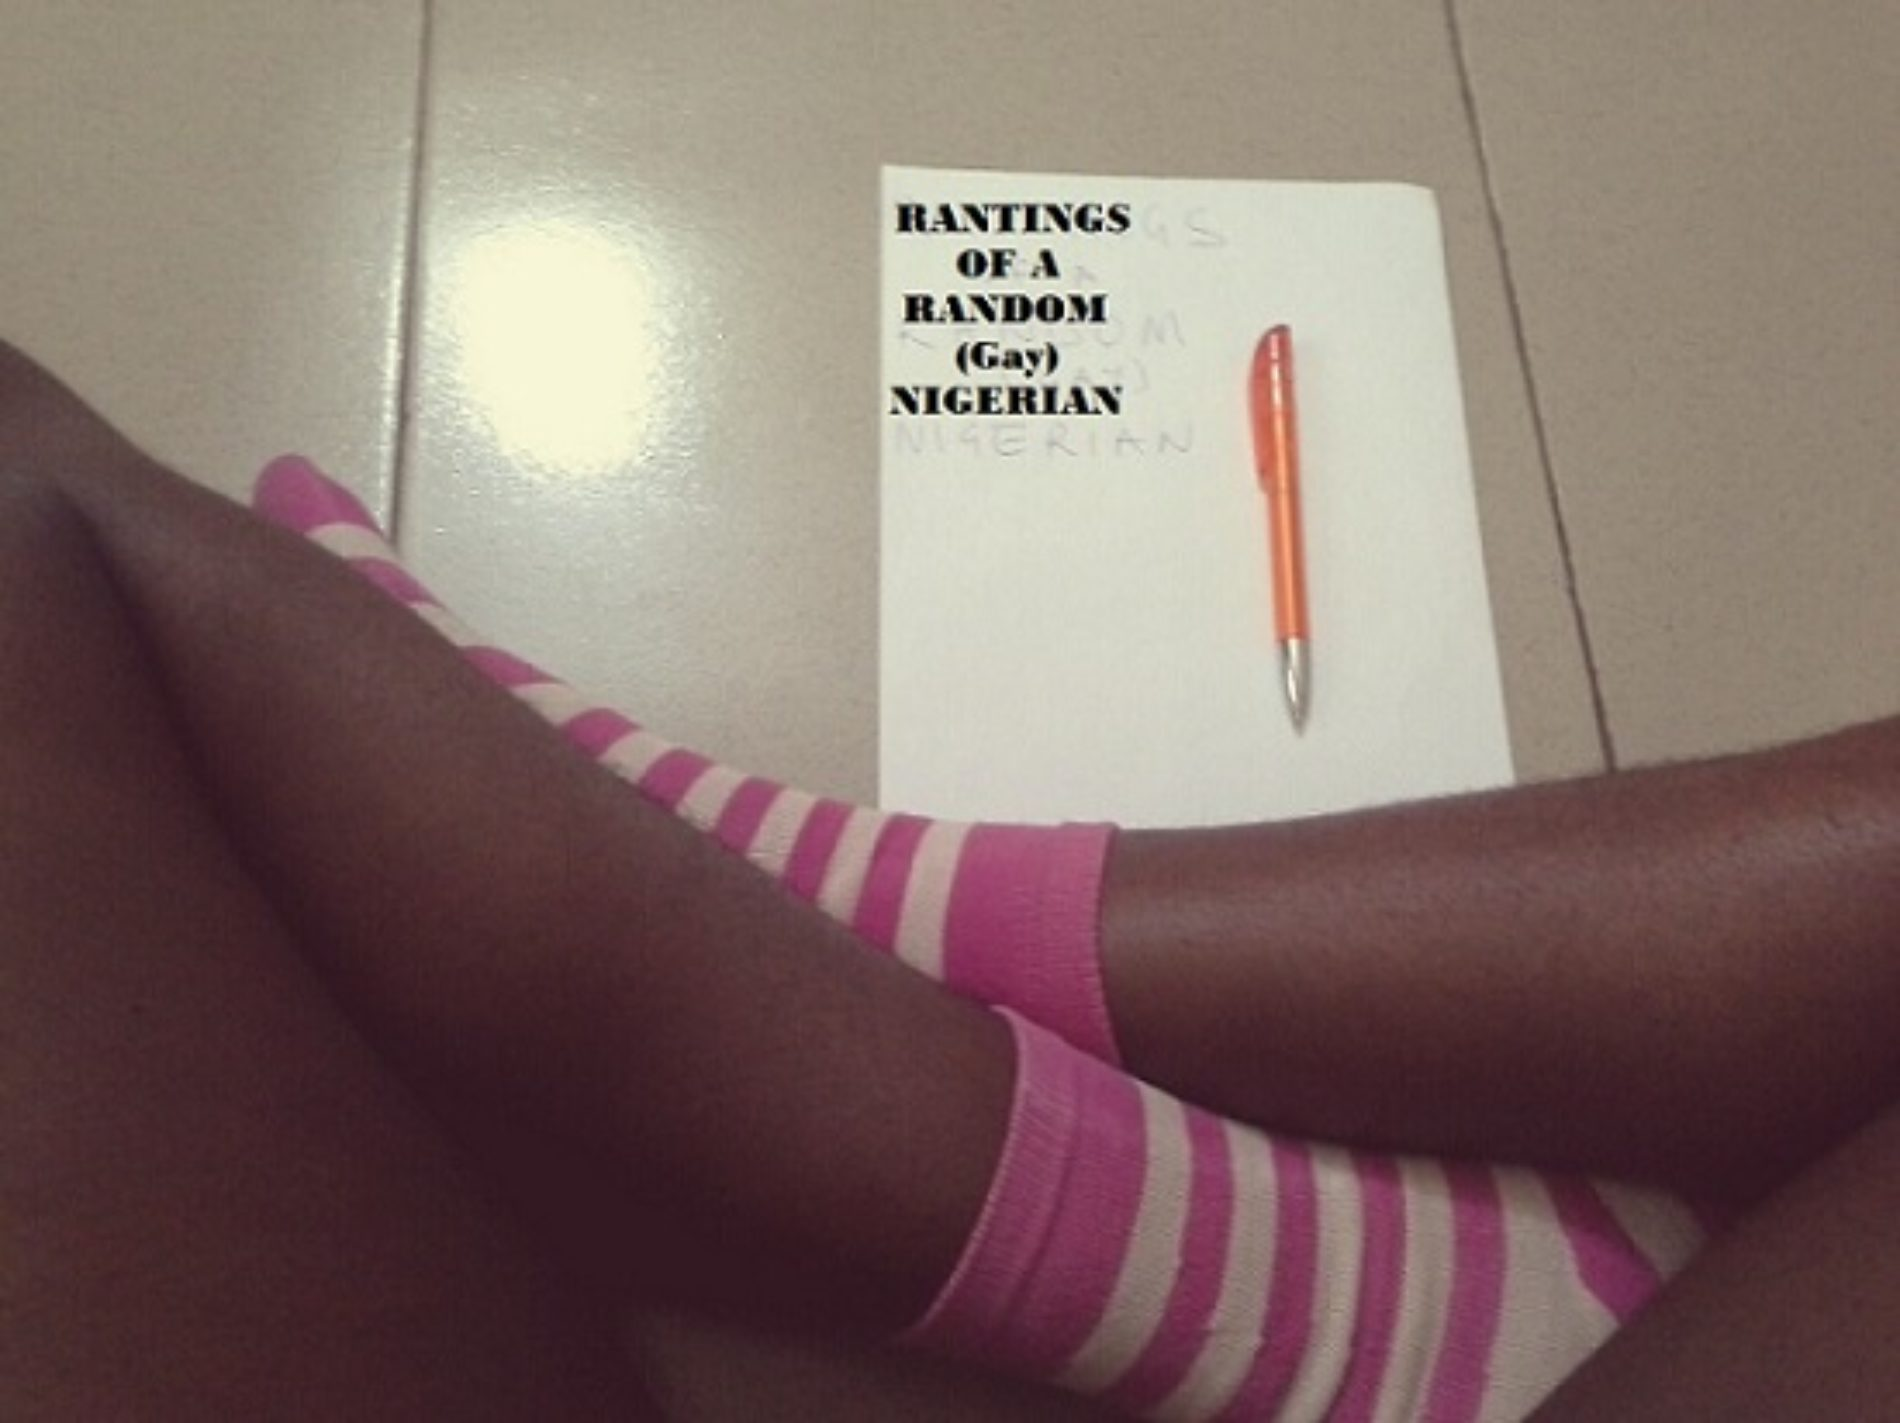 RANTINGS OF A RANDOM (Gay) NIGERIAN (Entry 64)